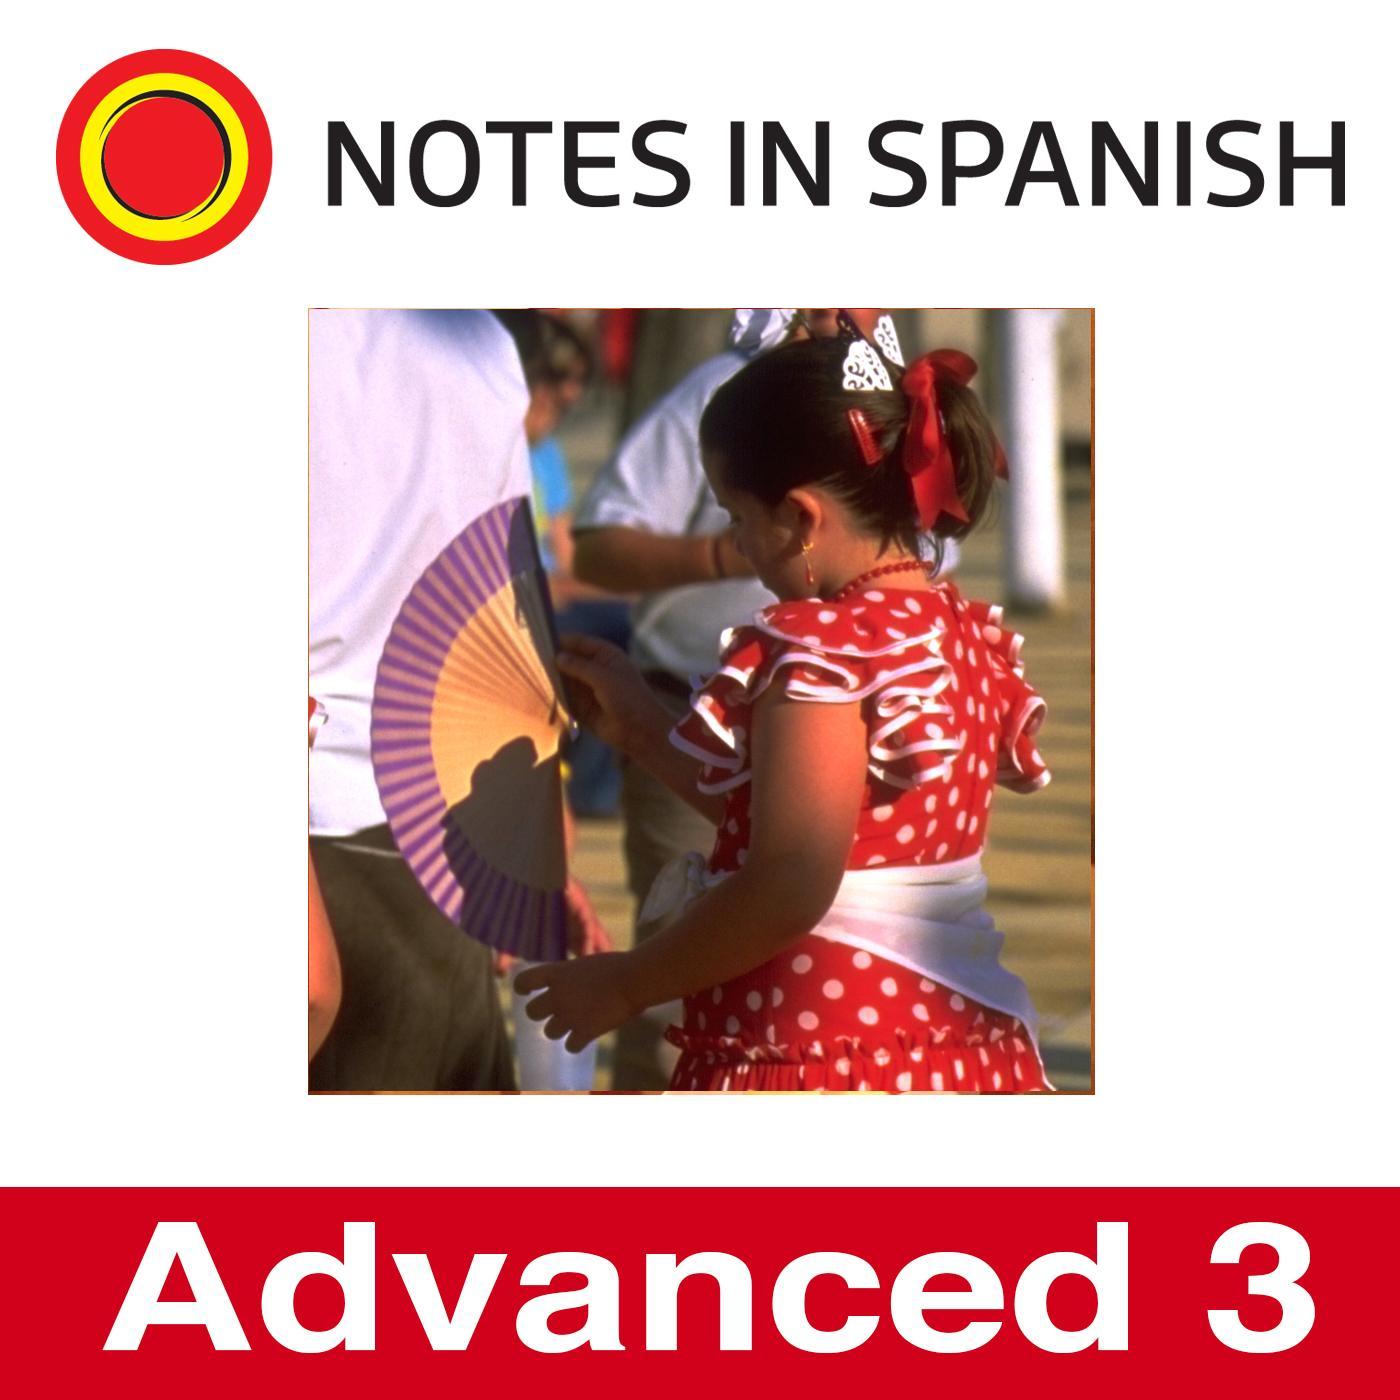 NIS Advanced S3 - 05 - MIcroAventuras